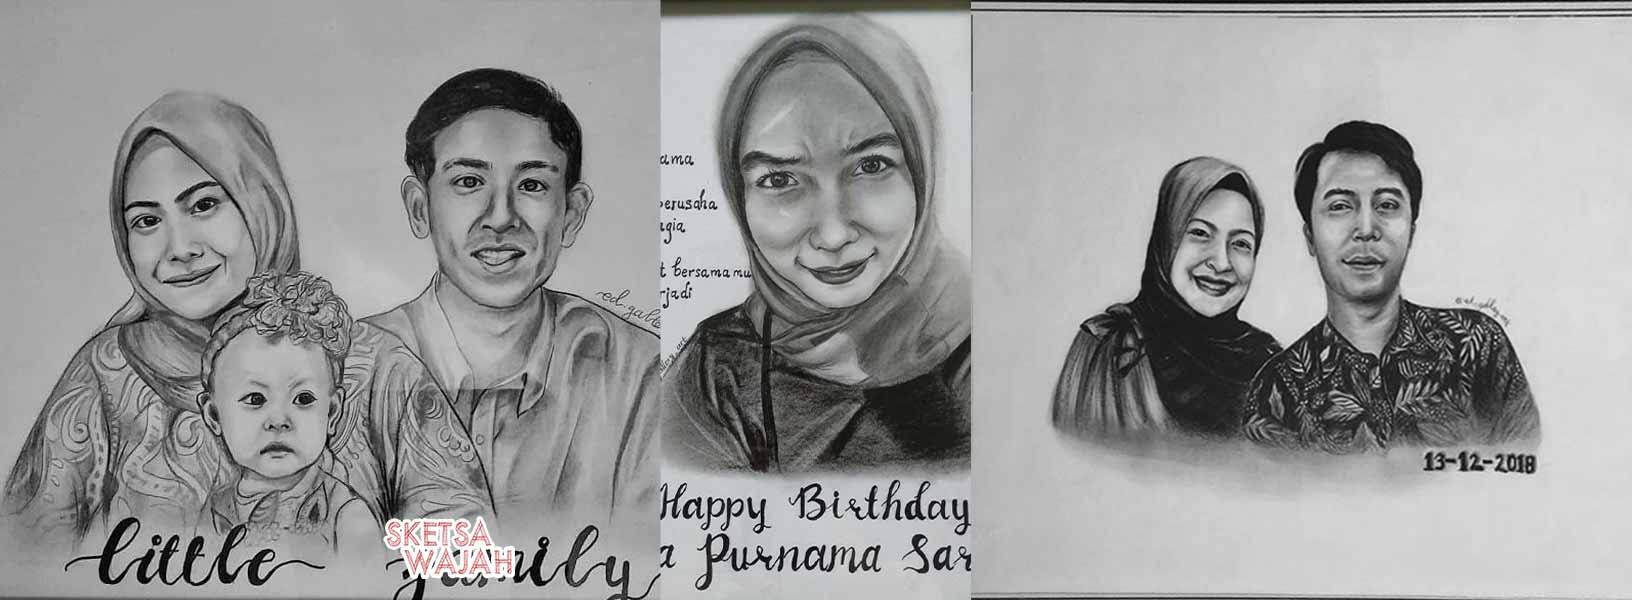 Karya Dhea Nurmala sketcher Sketsa Wajah